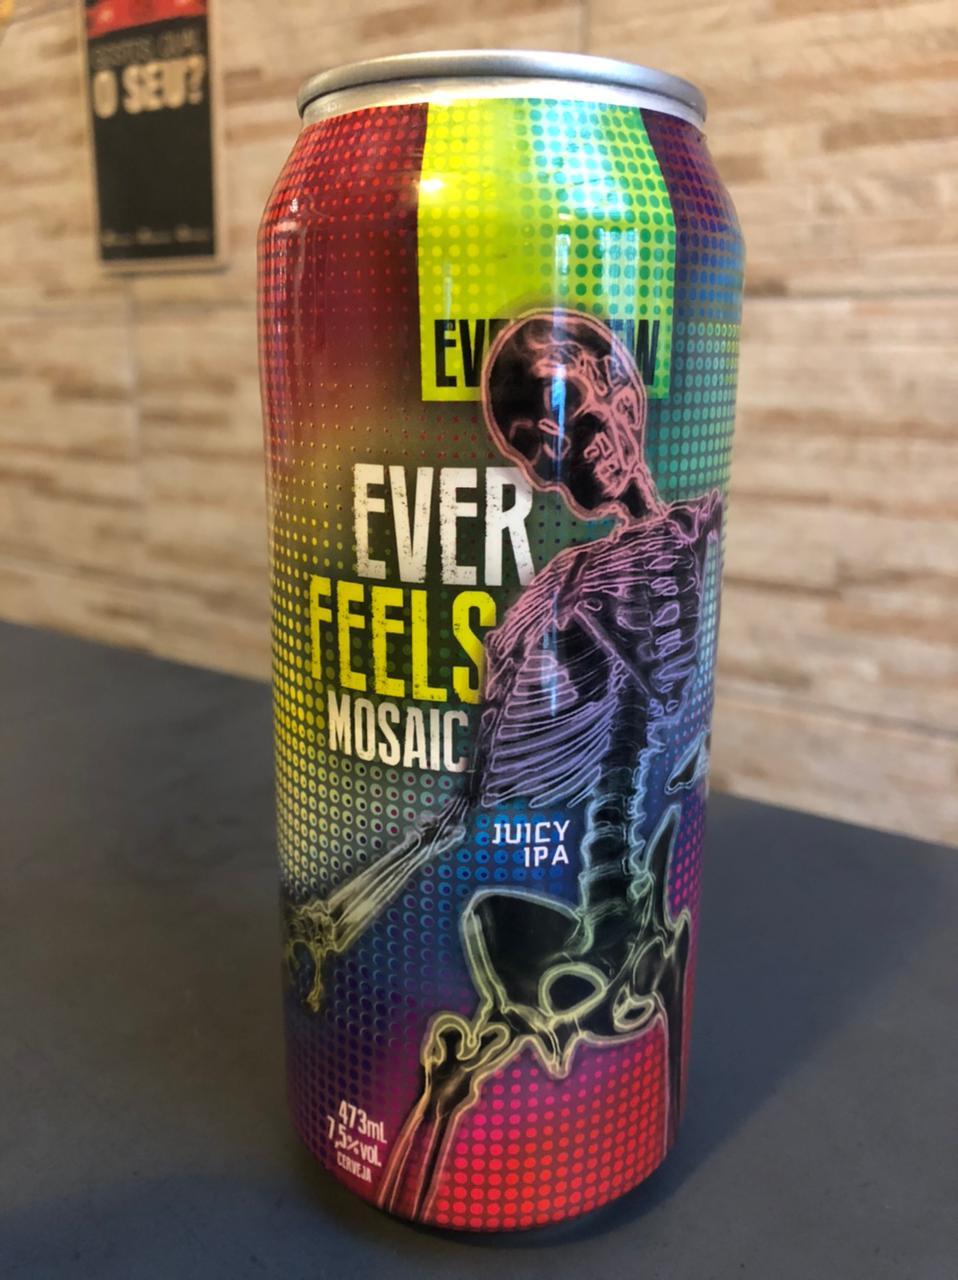 Everbrew EverFeels Mosaic Lata 473ml - Juicy IPA